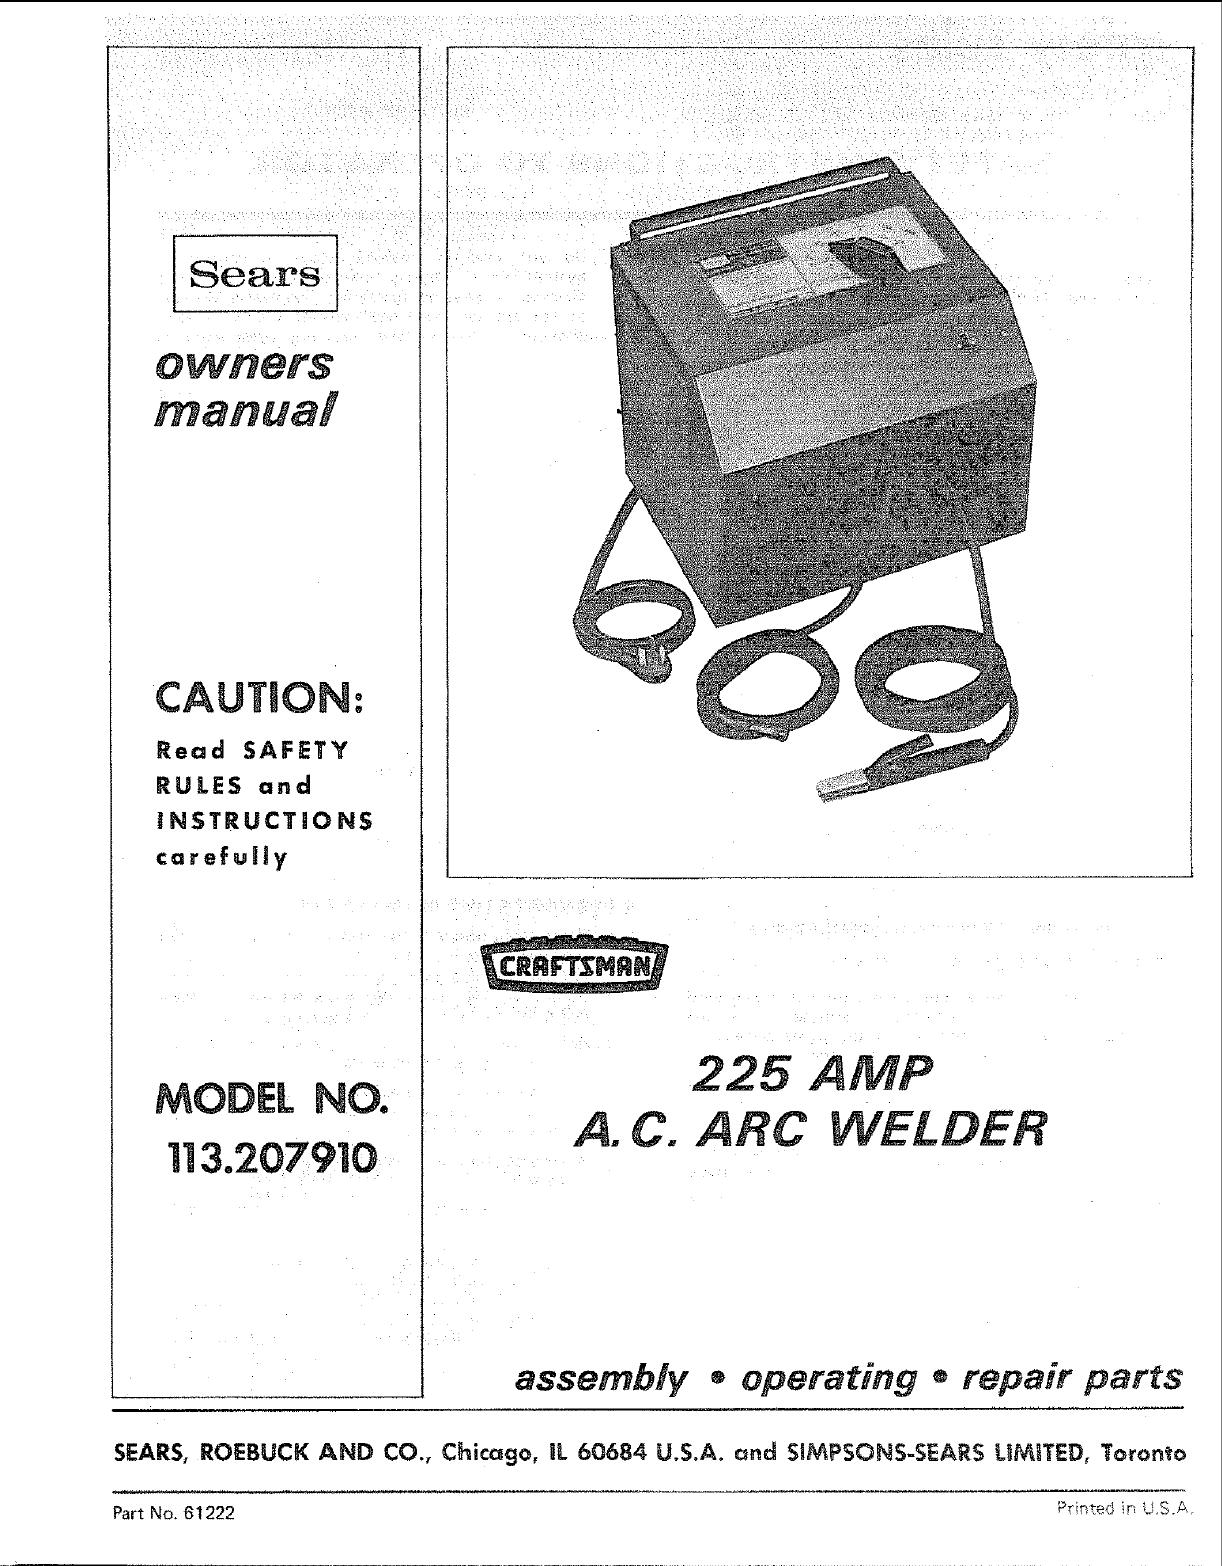 Craftsman 113207910 User Manual 225 Amp Ac Arc Welder Manuals And Wiring Diagram Guides L0806060